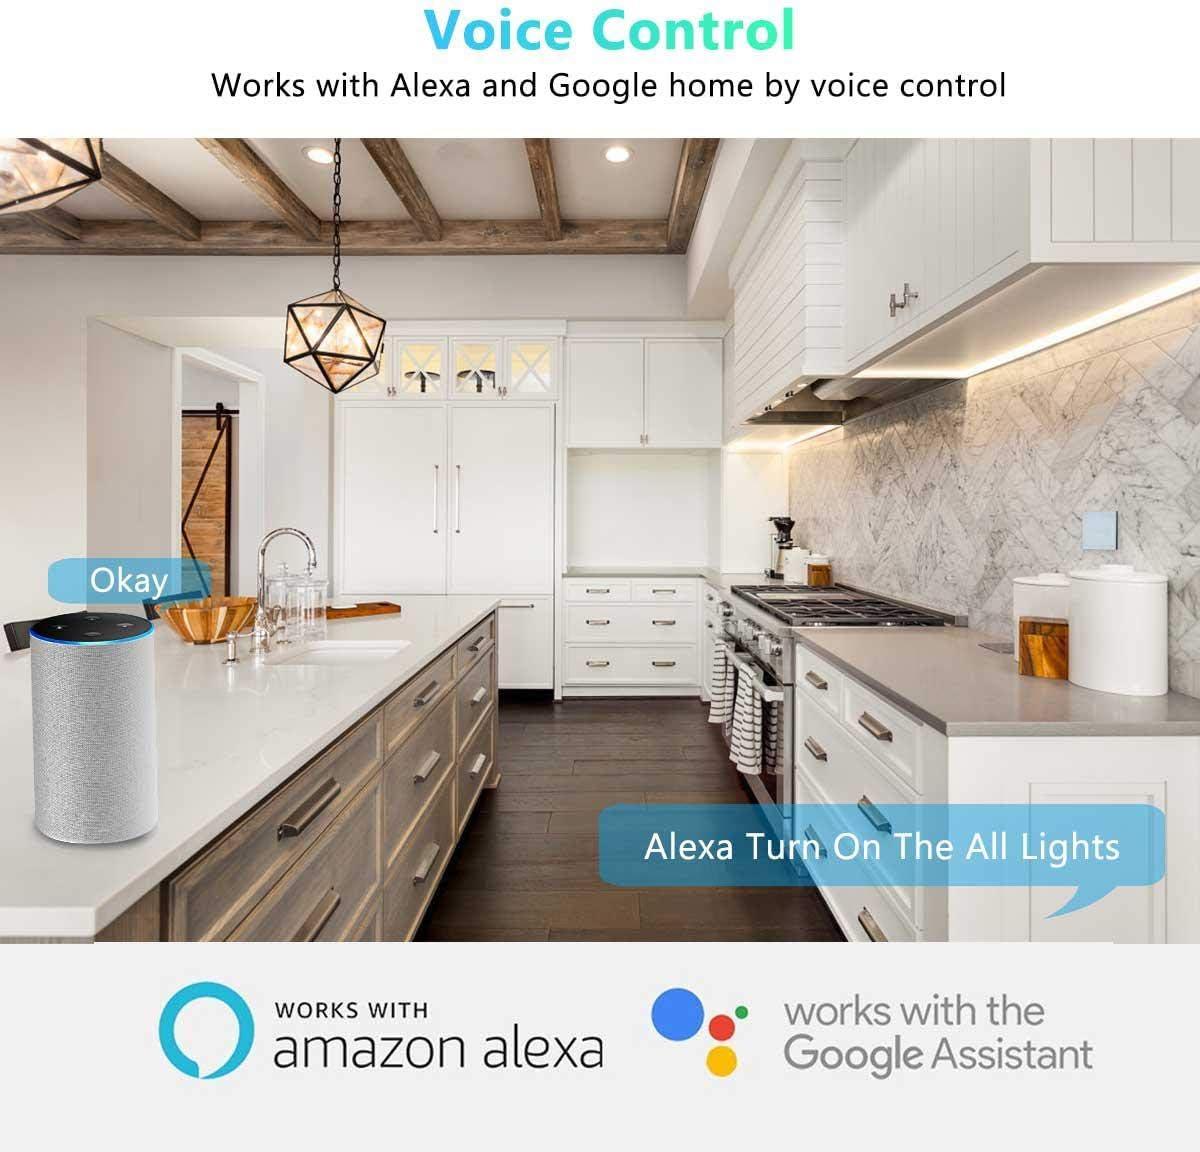 WiFi Smart Switch,Control Remoto inalámbrico Módulo de Interruptor inteligente con Timers Compatible con Alexa Echo Google Home IFTTT Google Nest,teléfono APP para iOS Android: Amazon.es: Hogar